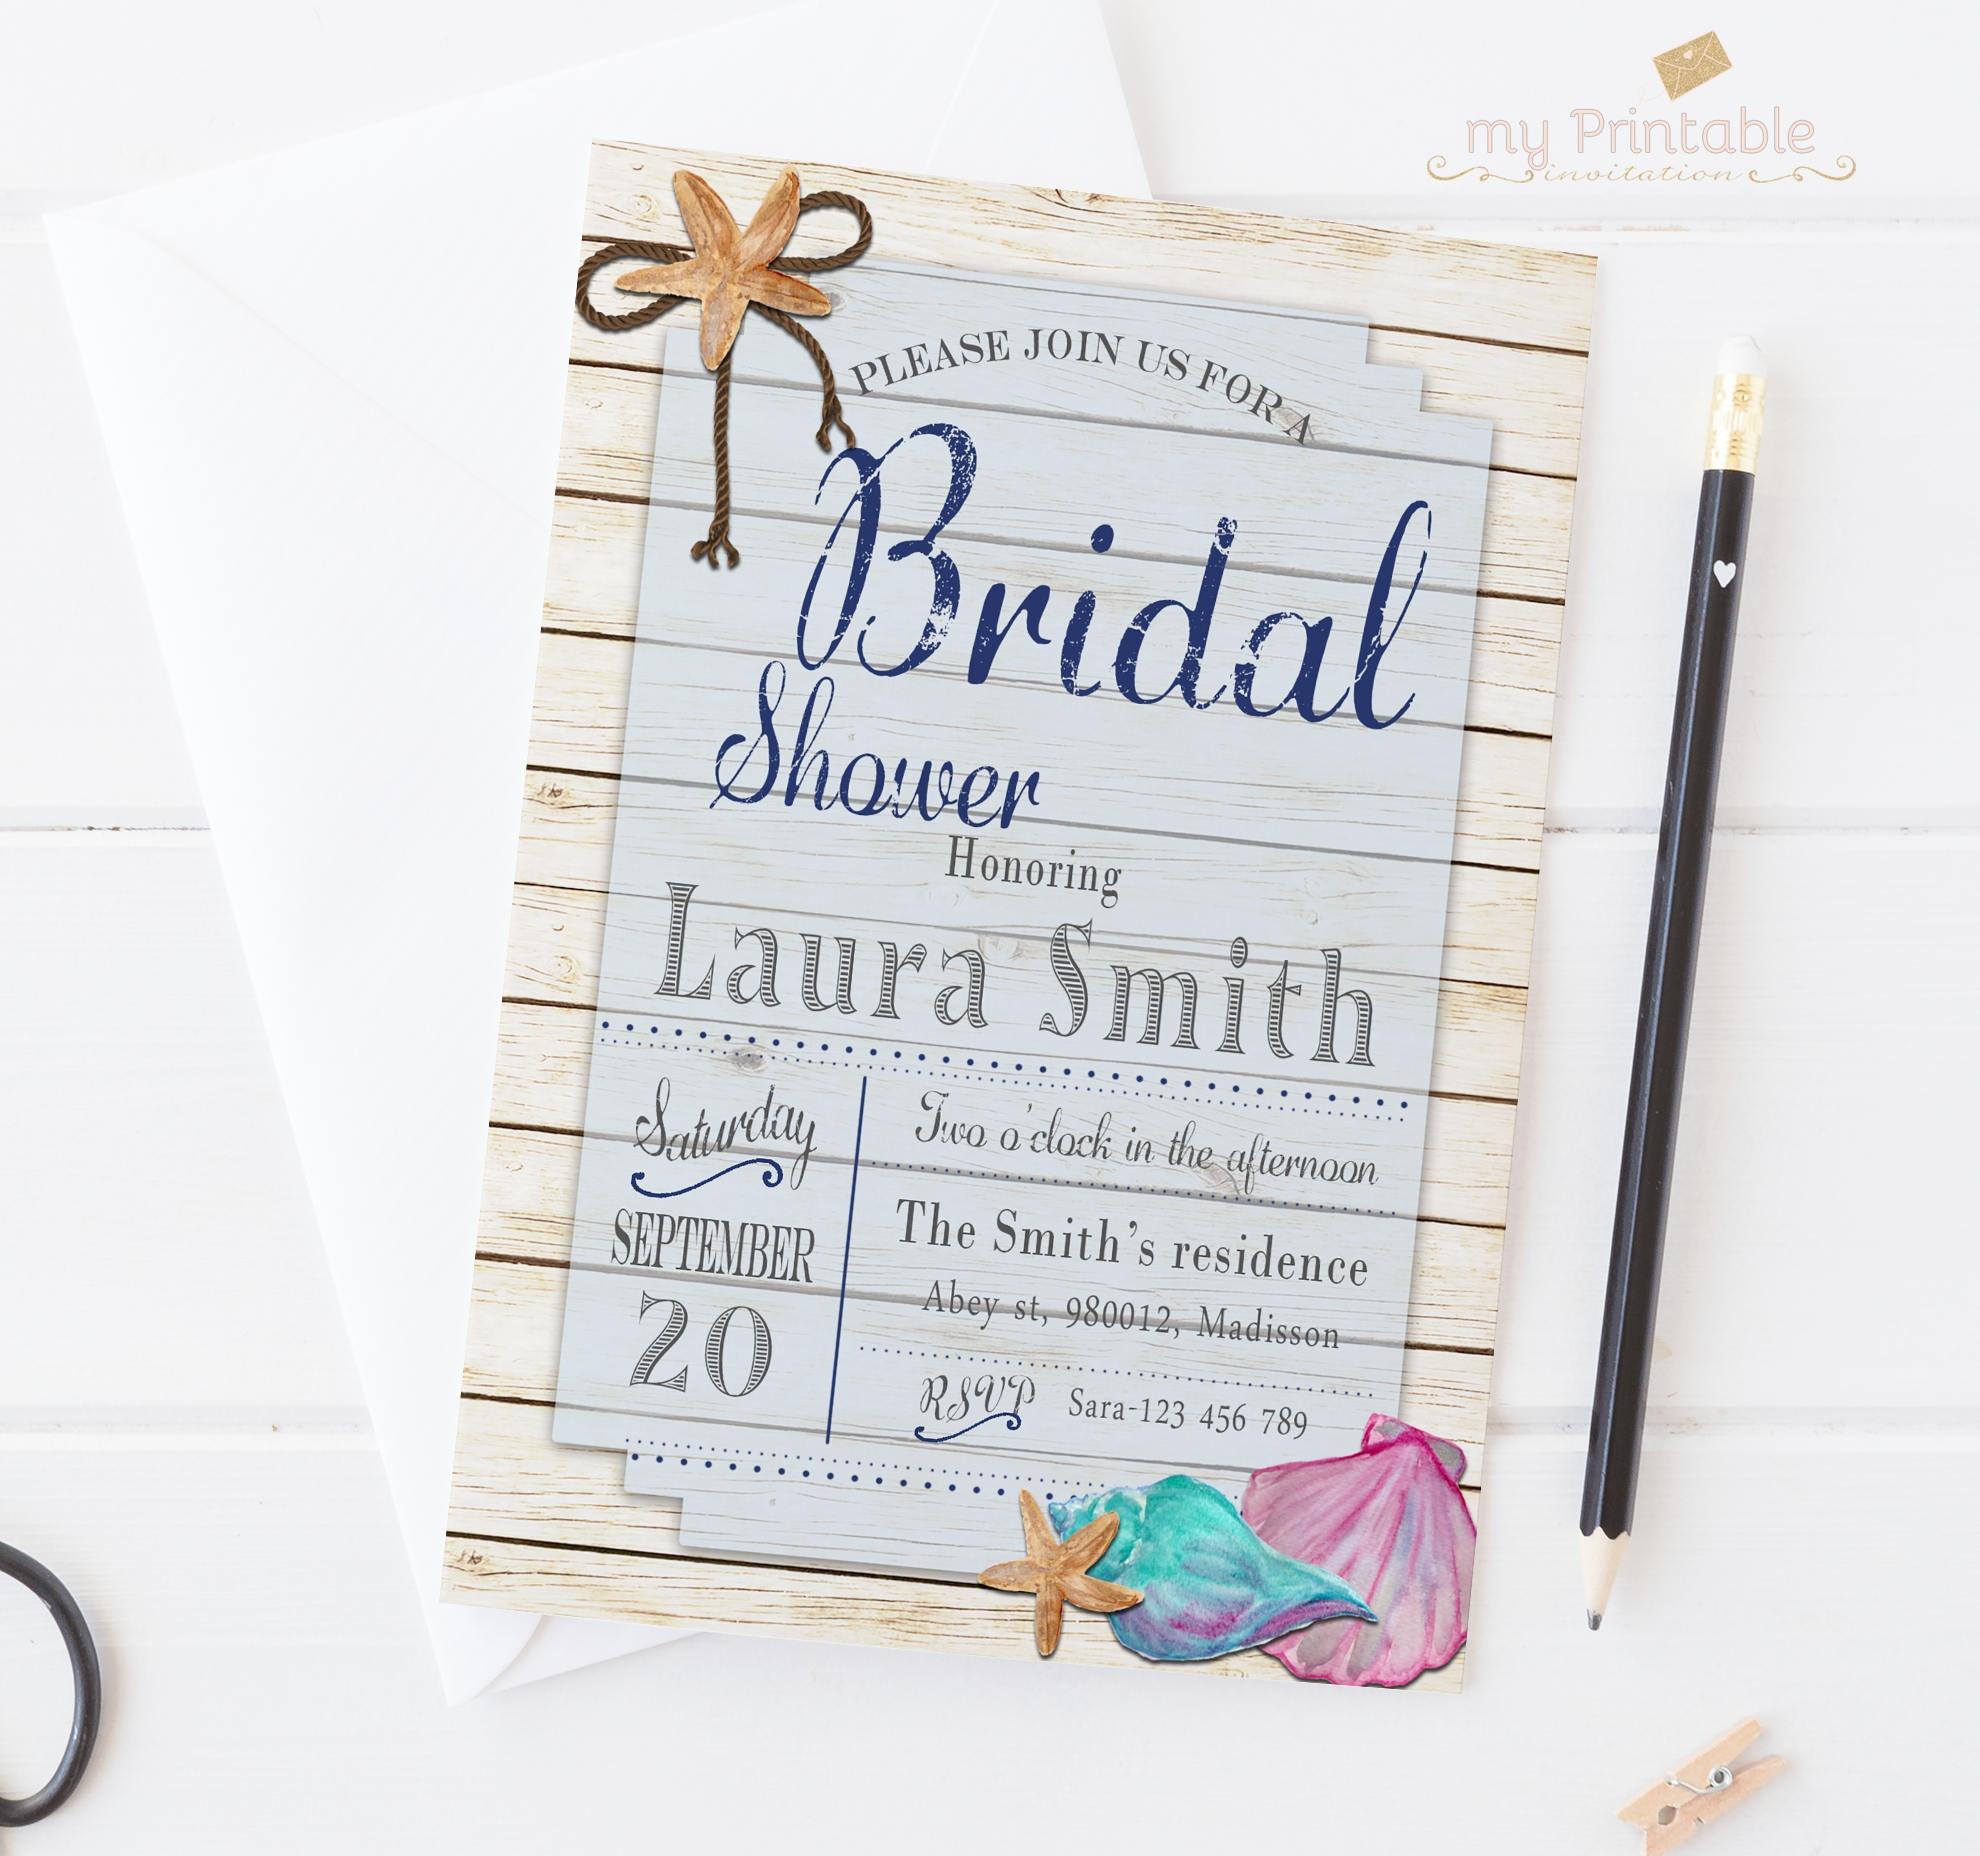 Beach Theme Bridal Shower Invitation Couples Shower Wedding | Etsy - Free Printable Beach Theme Bridal Shower Invitations